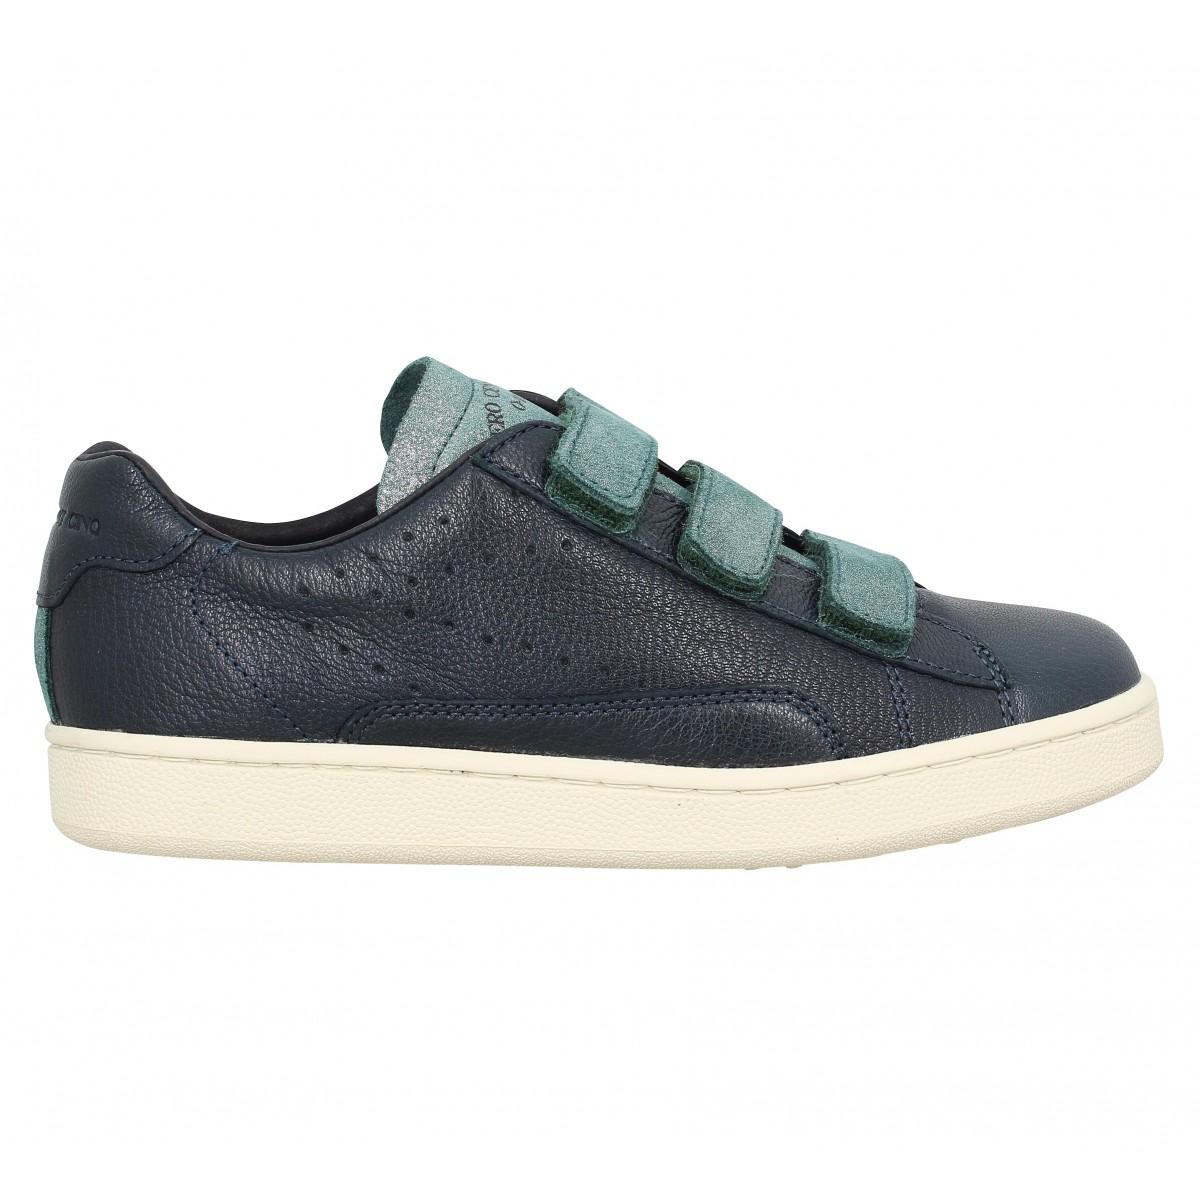 soldes 0 105 stan scratch aglae cuir femme indigo vert femme fanny chaussures. Black Bedroom Furniture Sets. Home Design Ideas